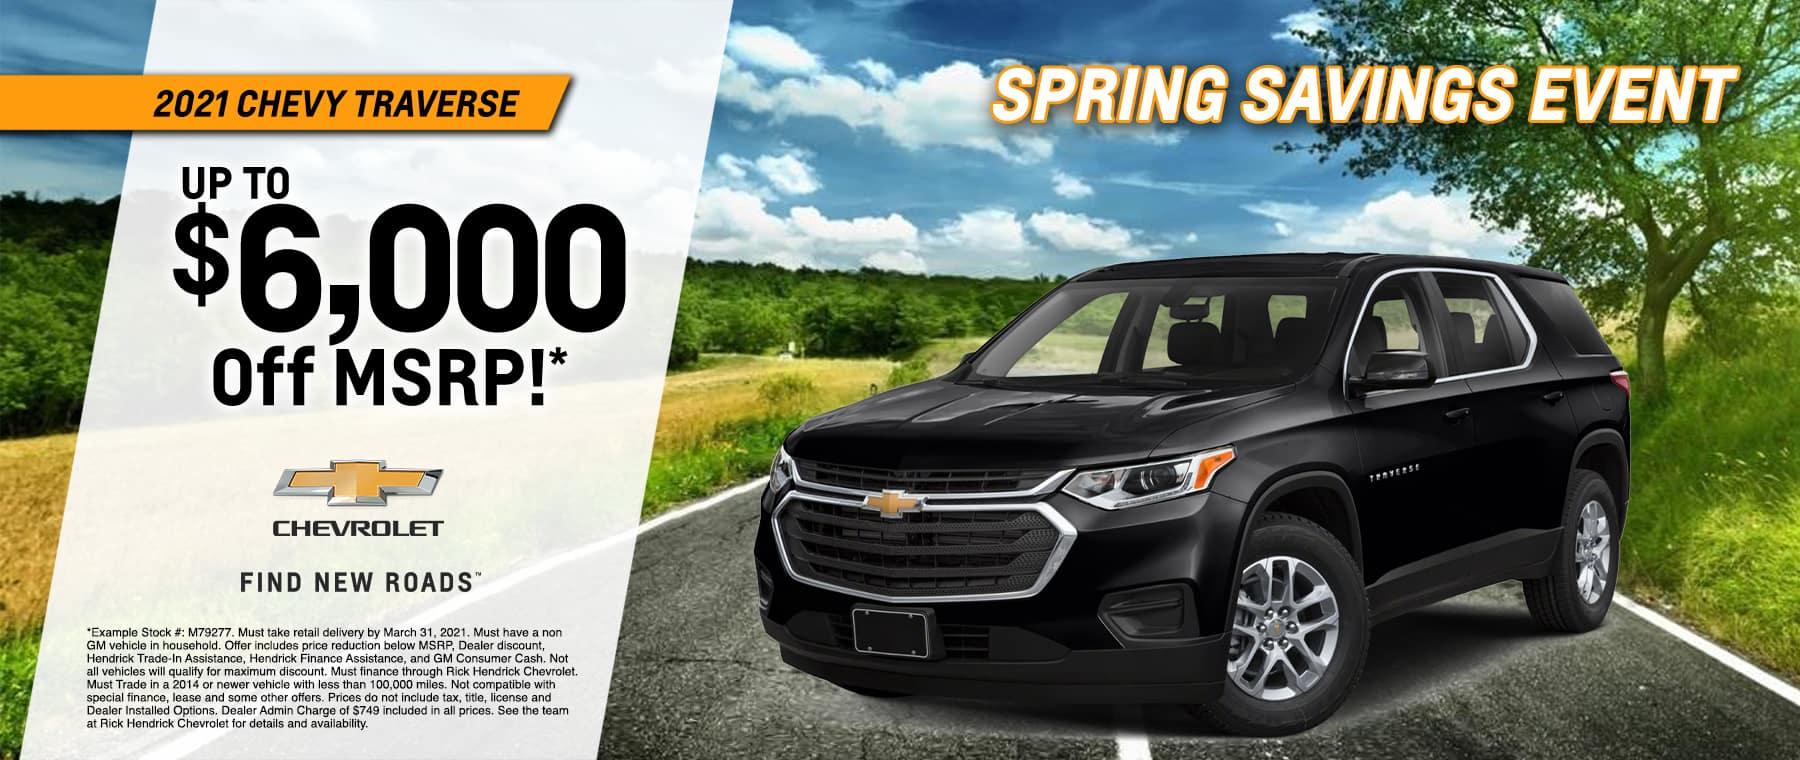 Rick Hendrick Chevrolet New And Used Auto Dealership Buford Ga